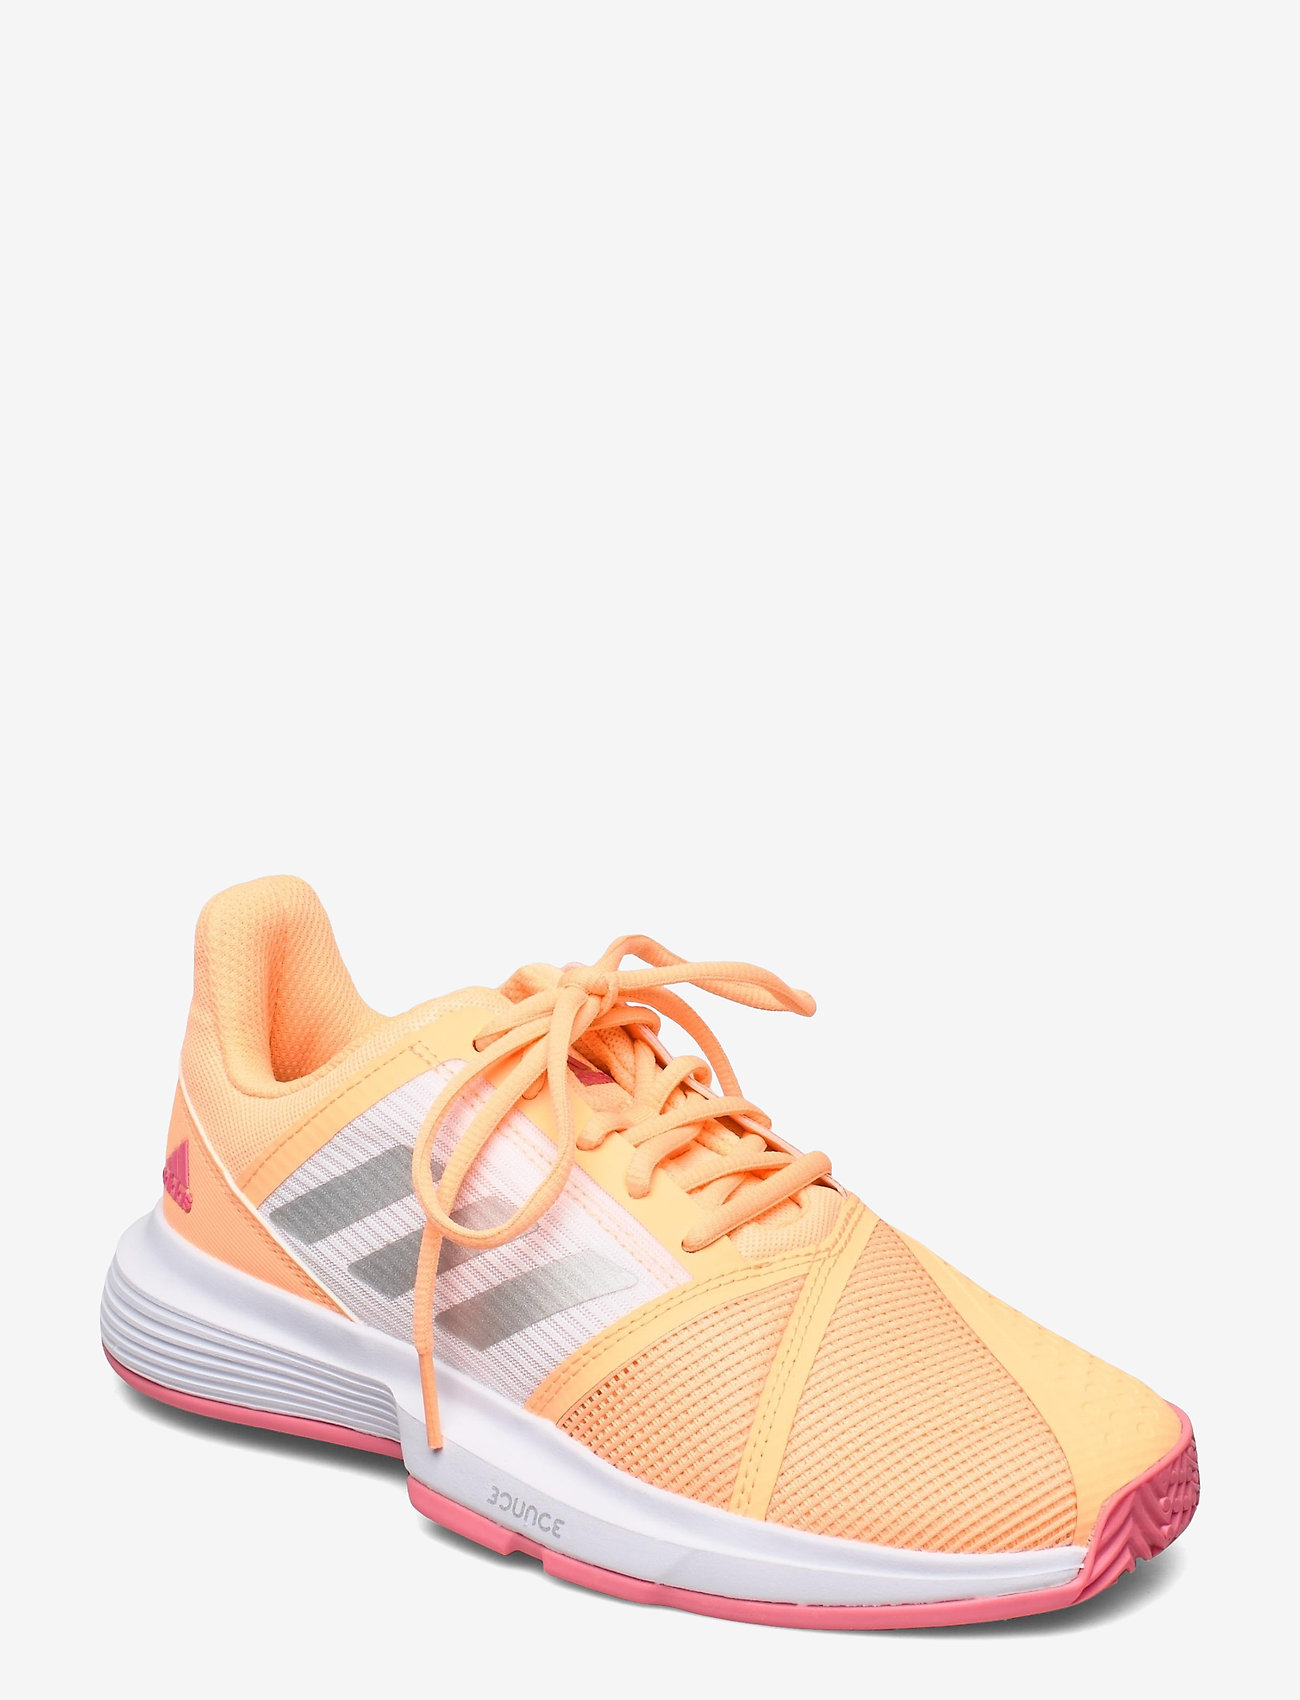 adidas Performance - CourtJam Bounce Shoes - ketsjersportsko - orange - 0